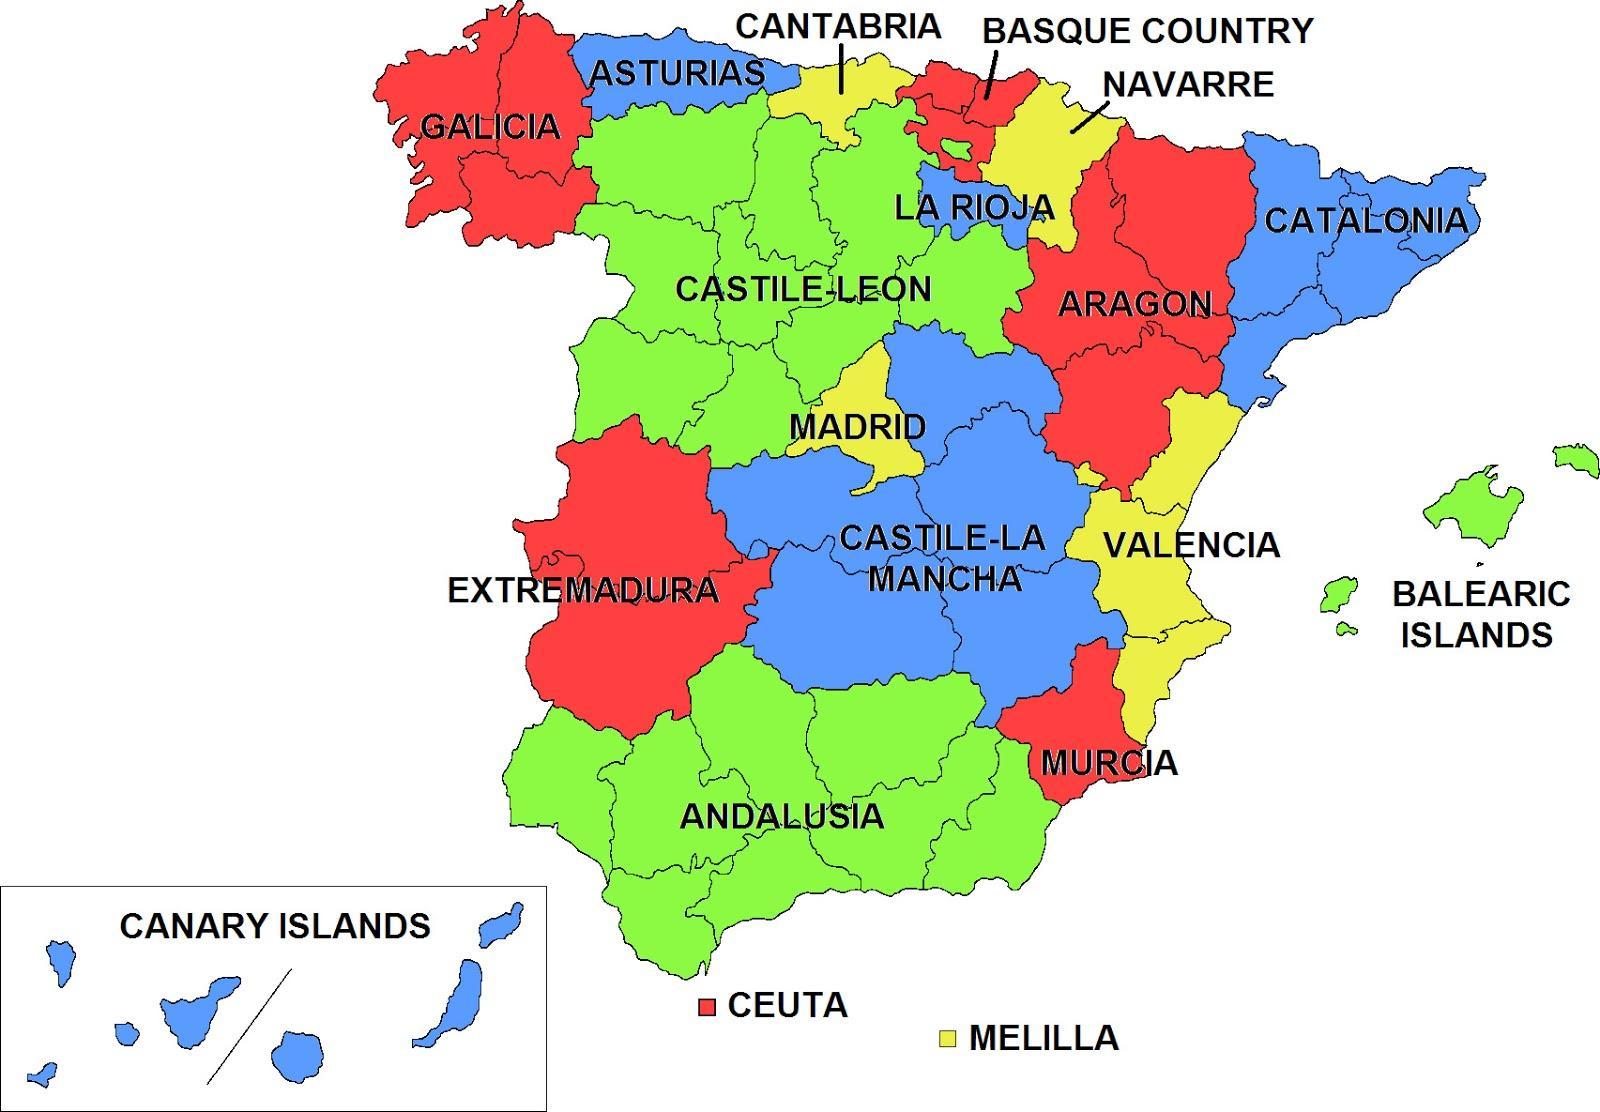 spania kart regioner Spania regioner kart   Kart over Spania og regioner (Sør Europa  spania kart regioner